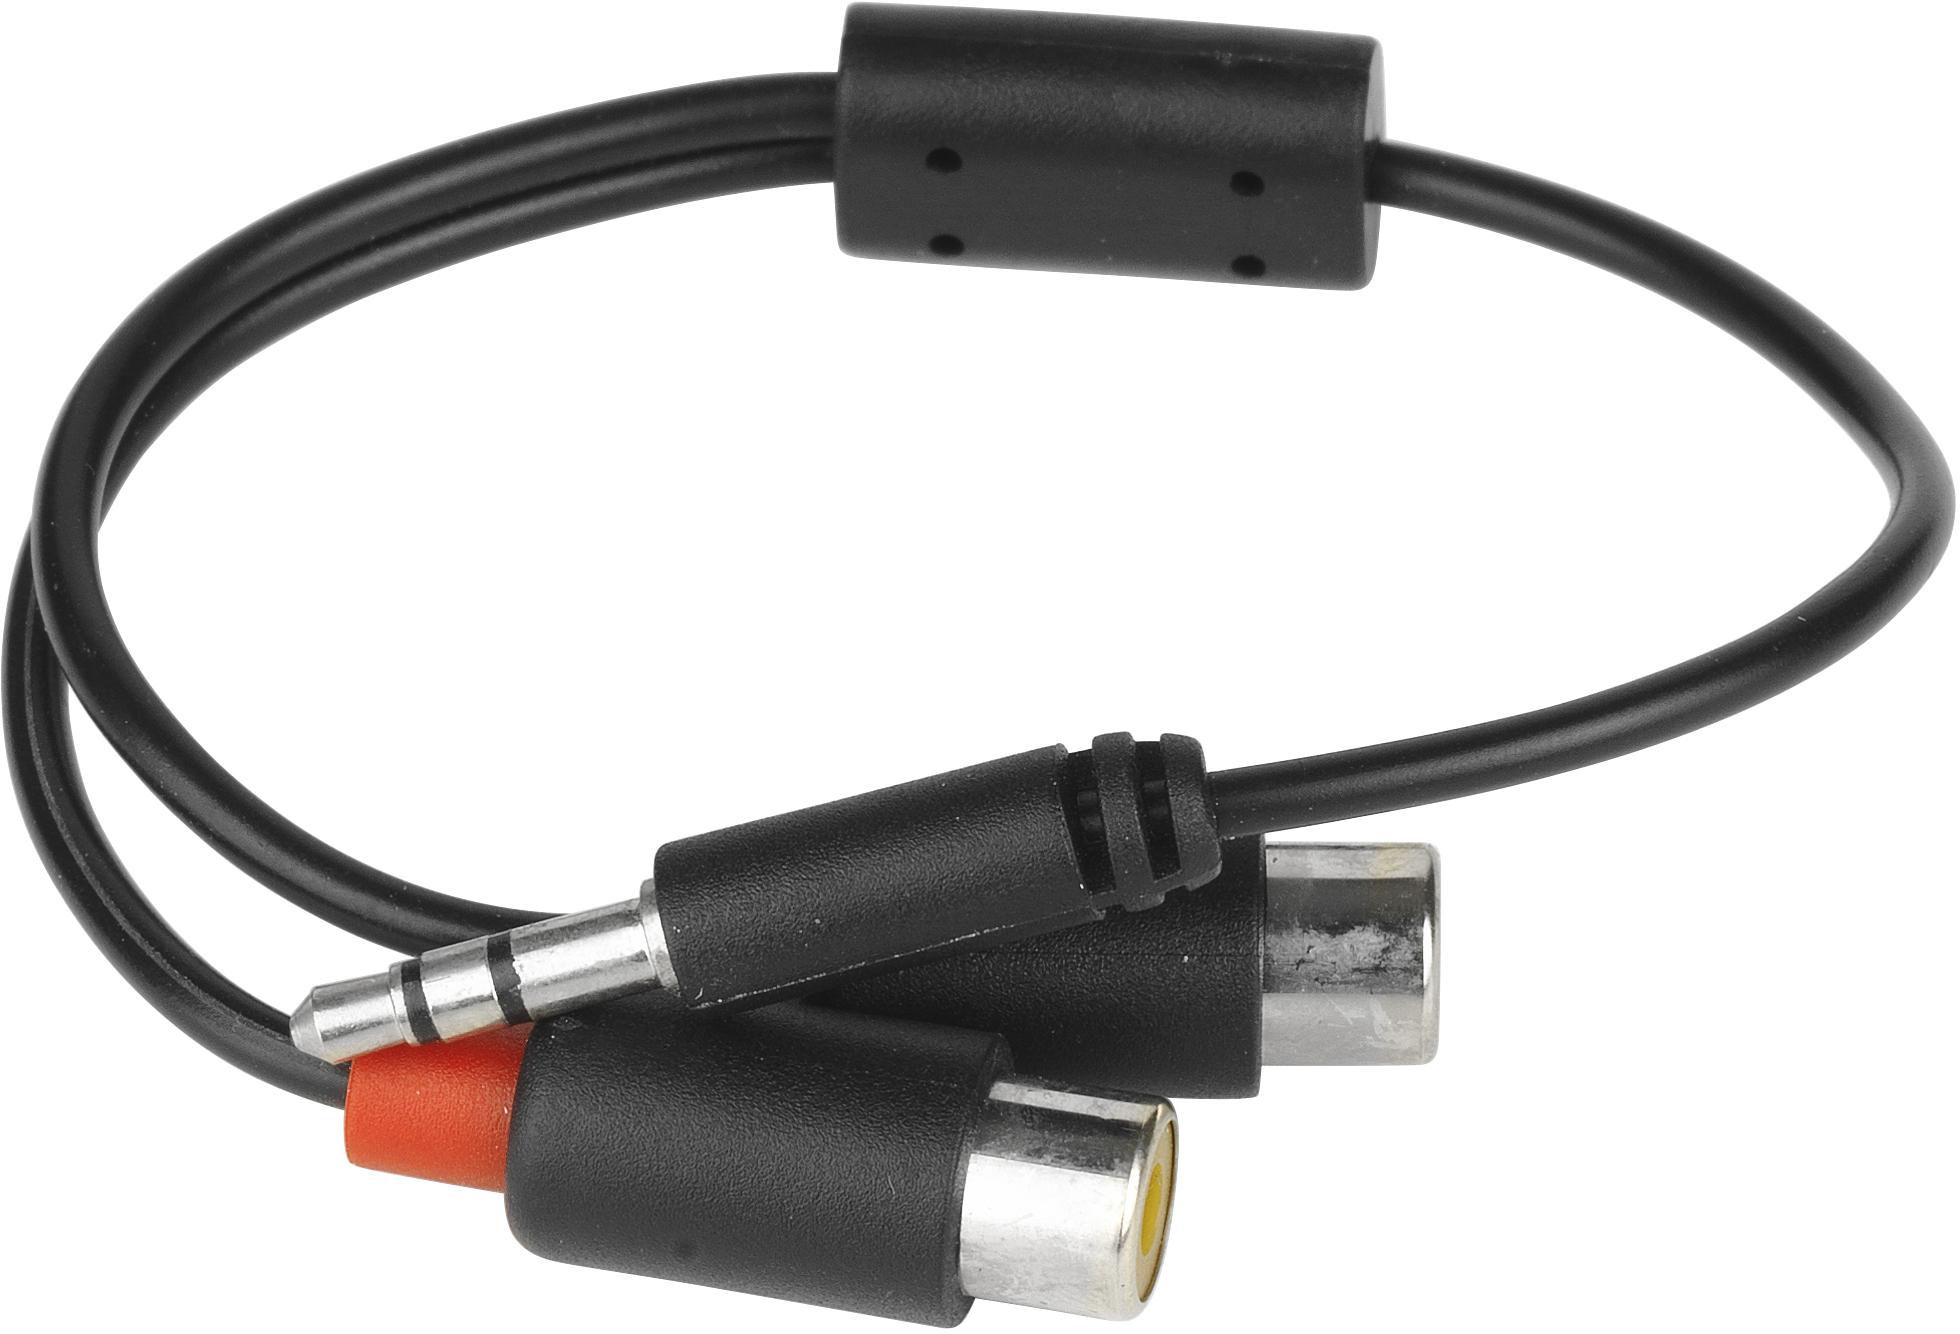 eSTUFF 0.15m 3.5mm - 2x RCA Black audio splitter